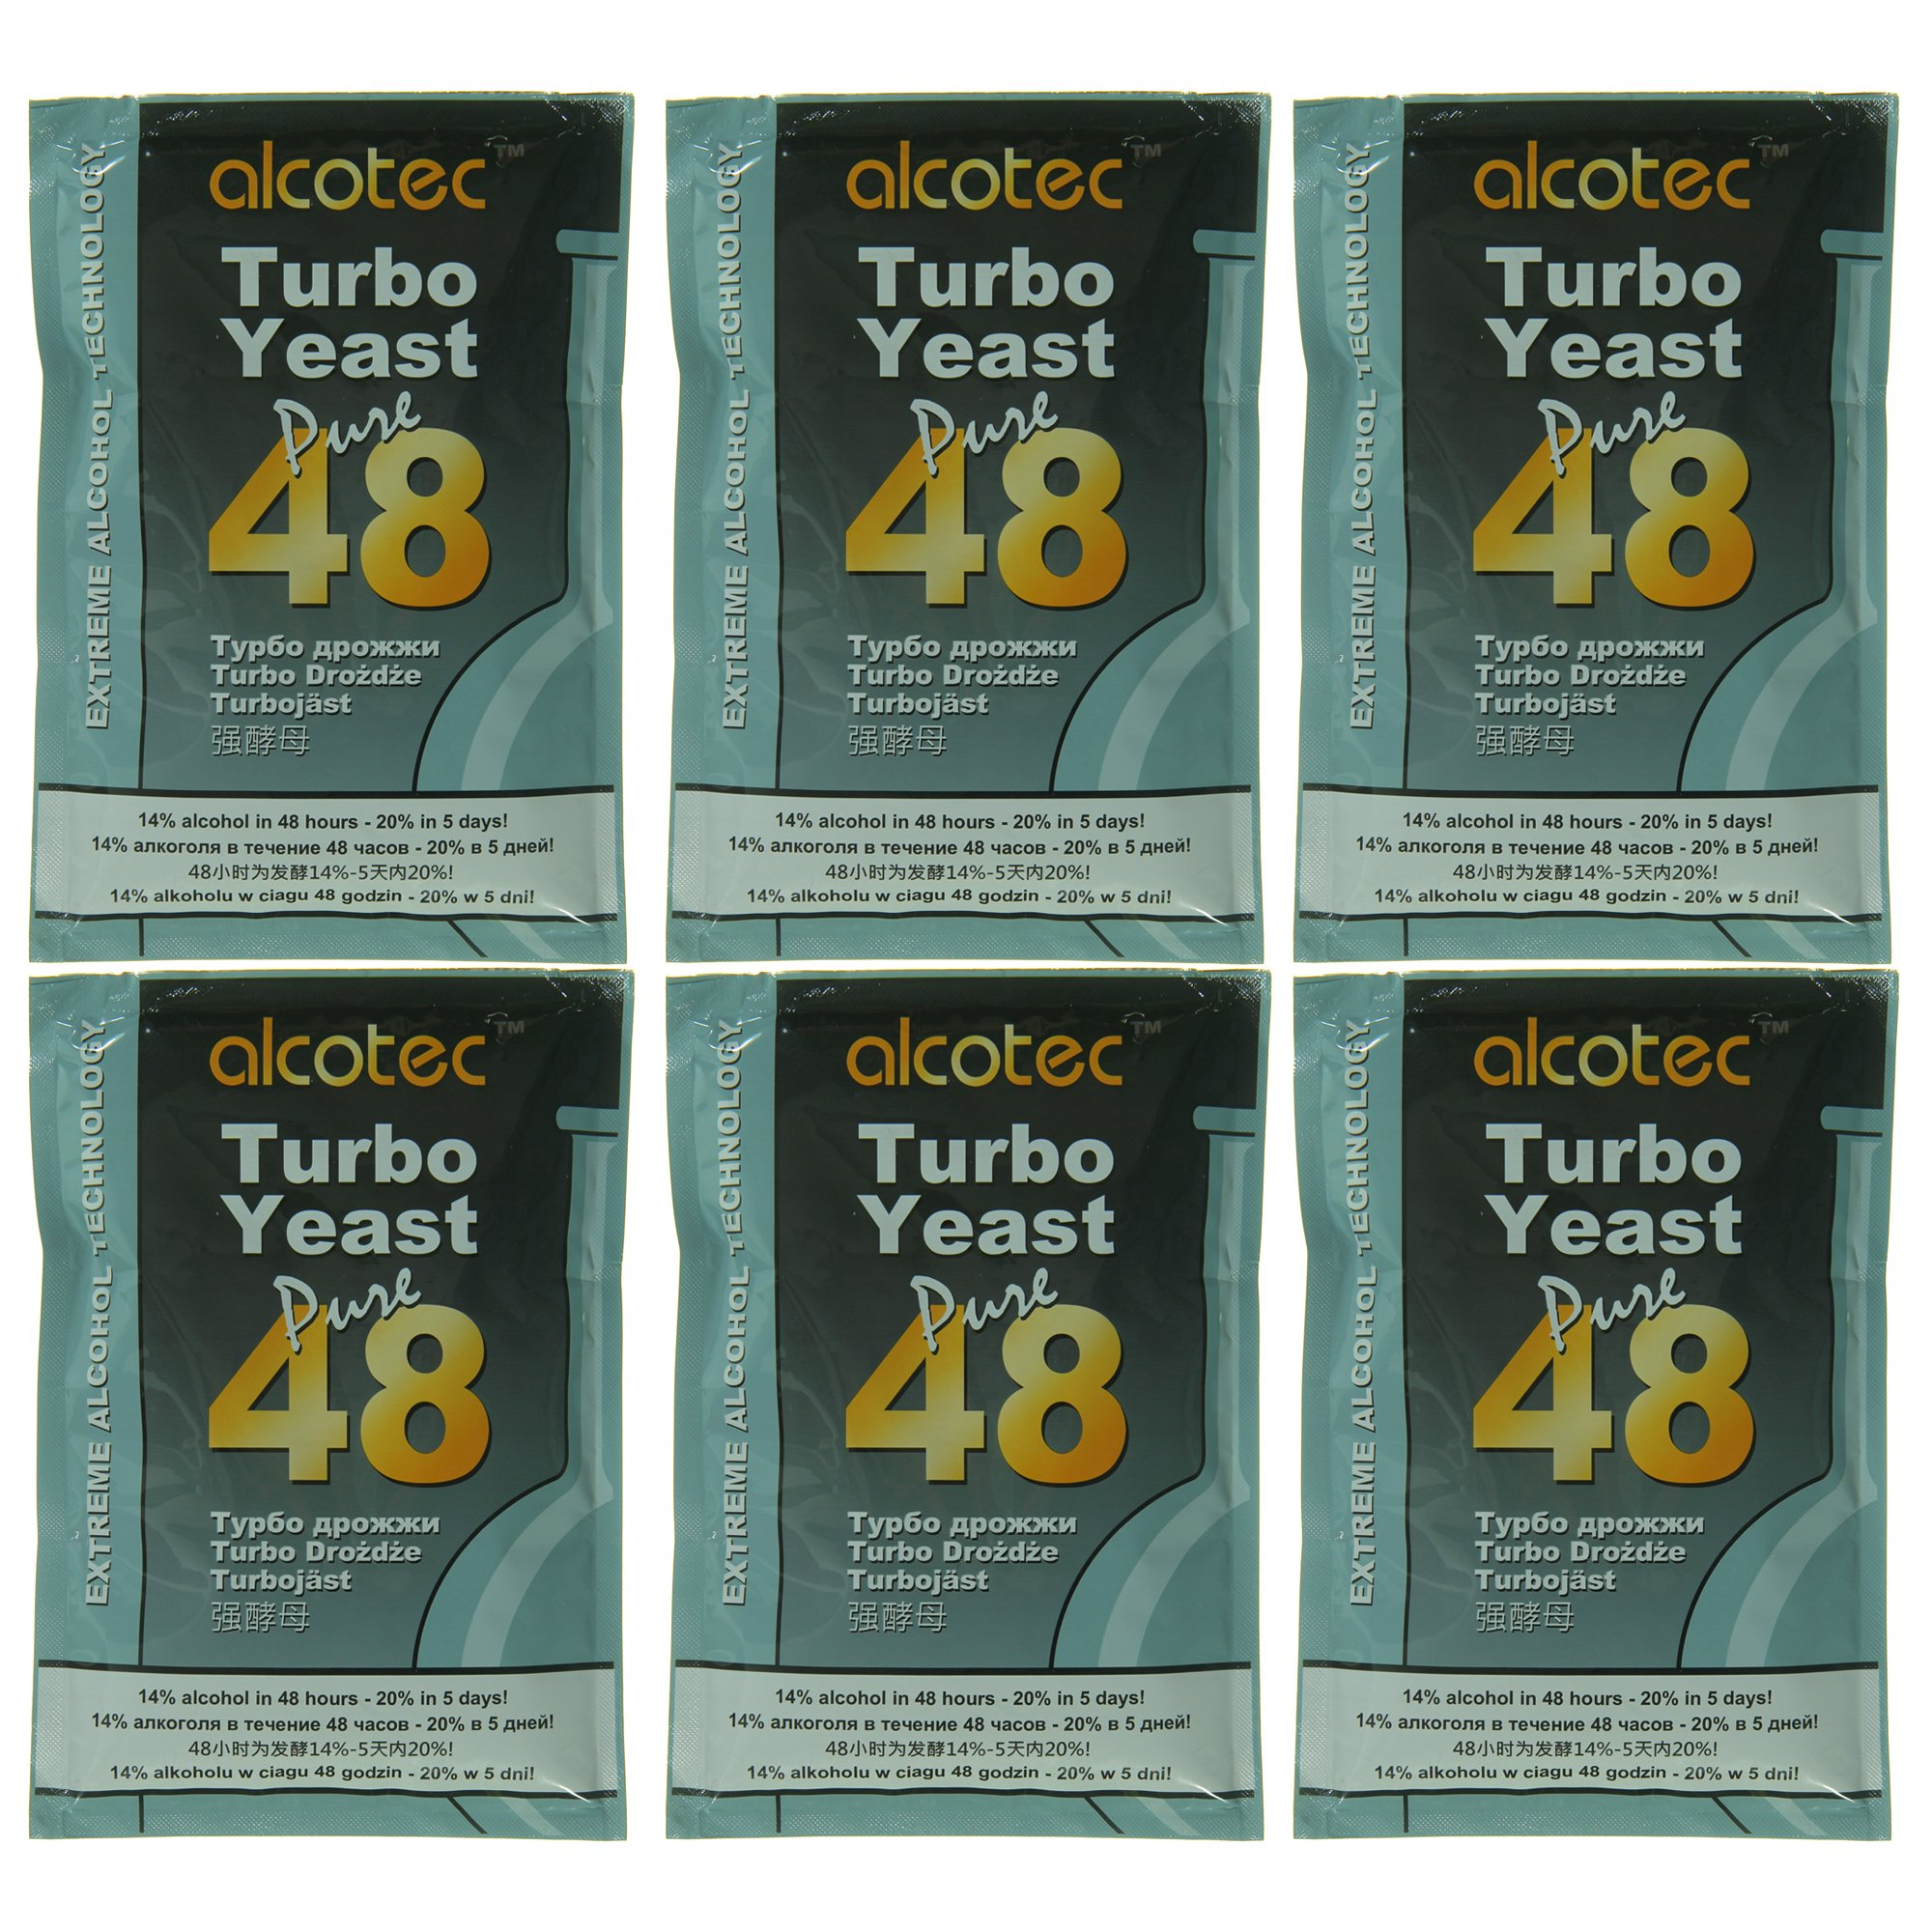 Alcotec 48 Hour Turbo Yeast (Pack of 6)